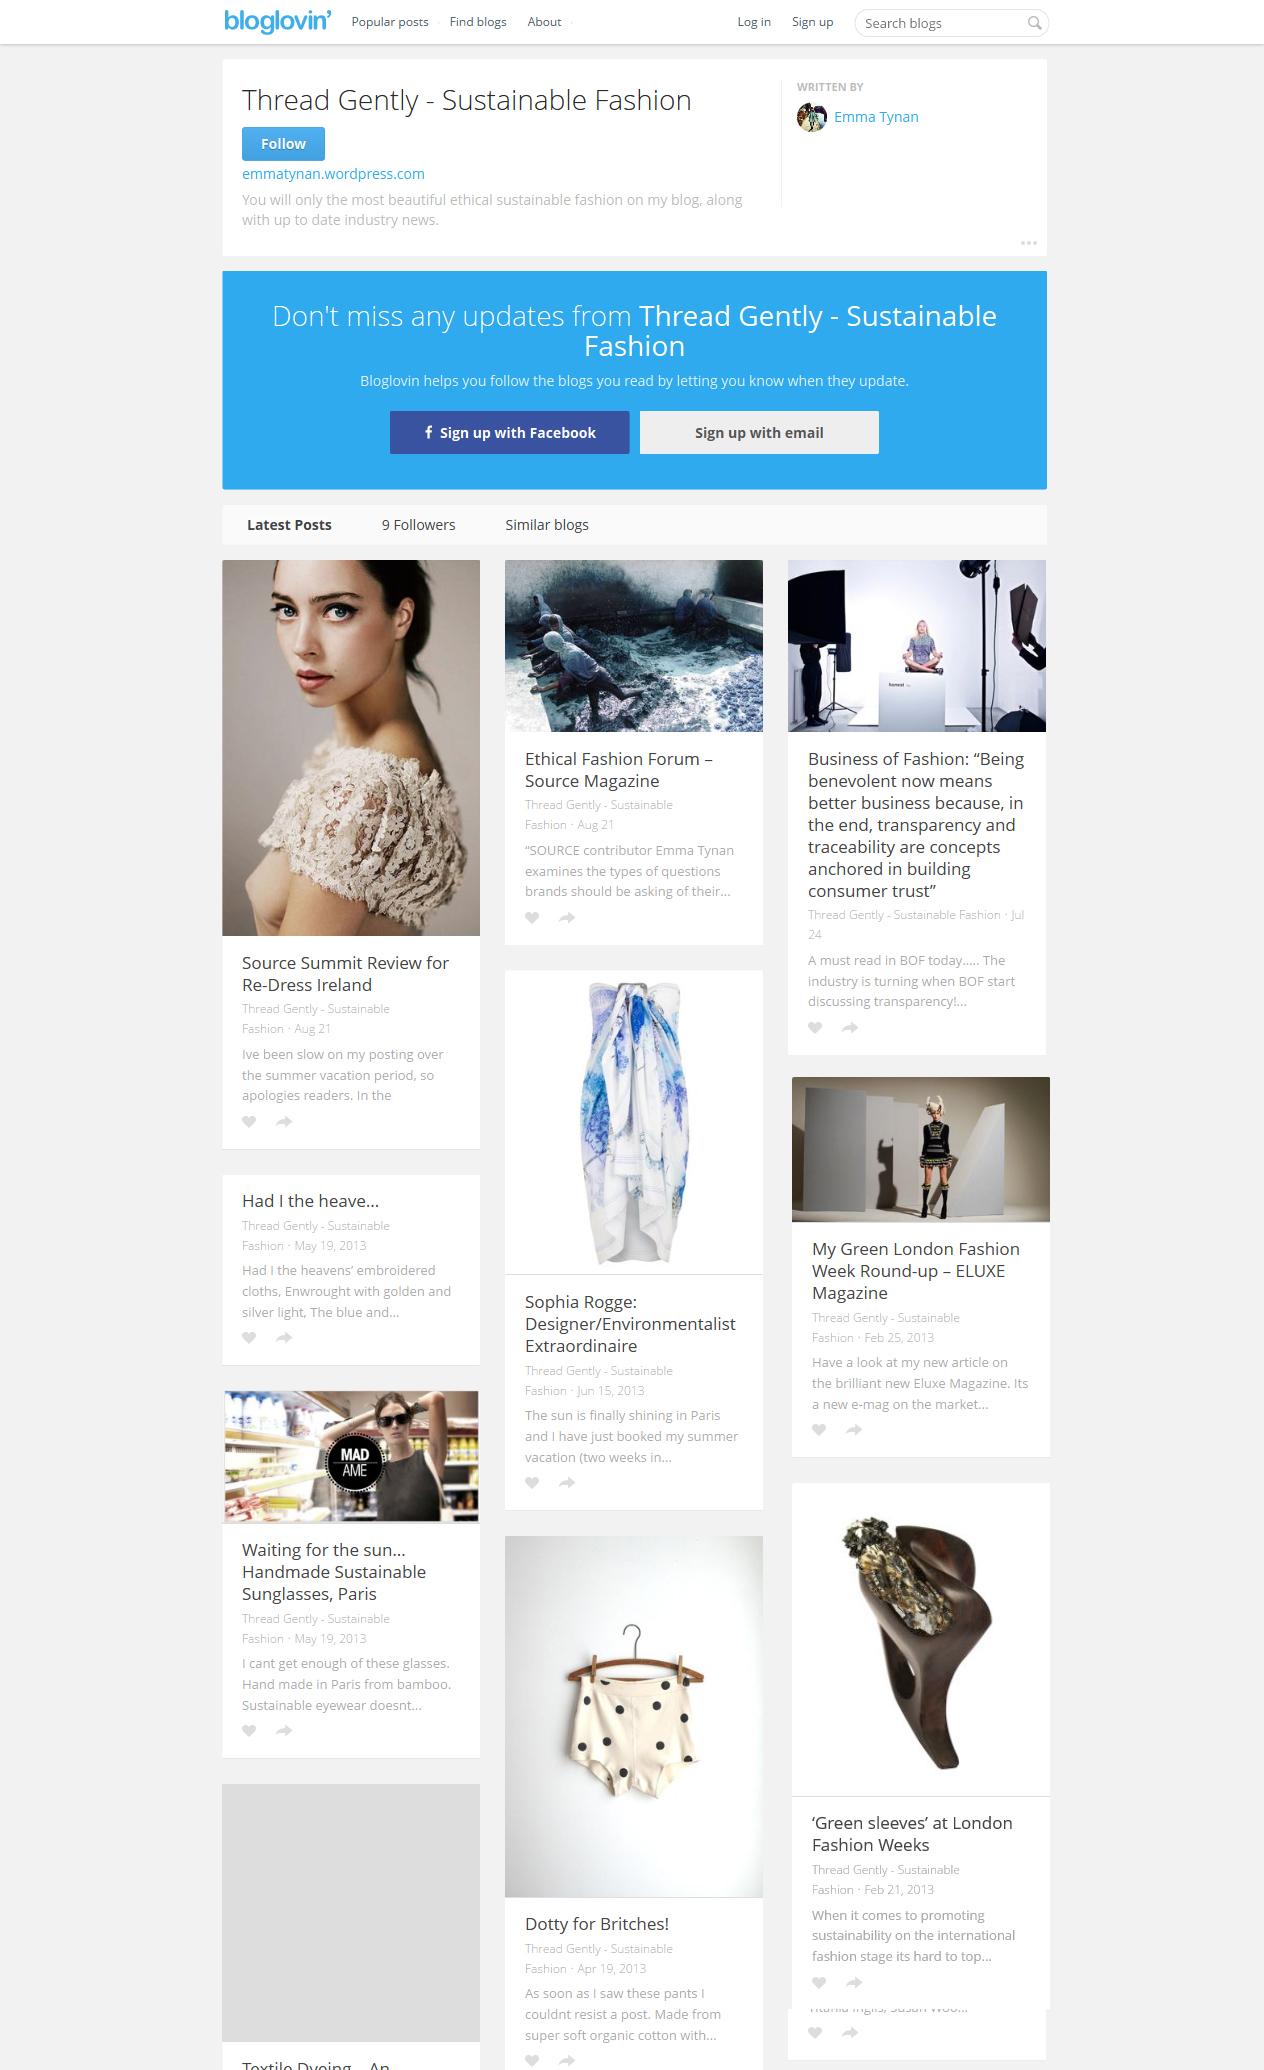 Thread_Gently_-_Sustainable_Fashion_on_Bloglovin_-_2014-06-30